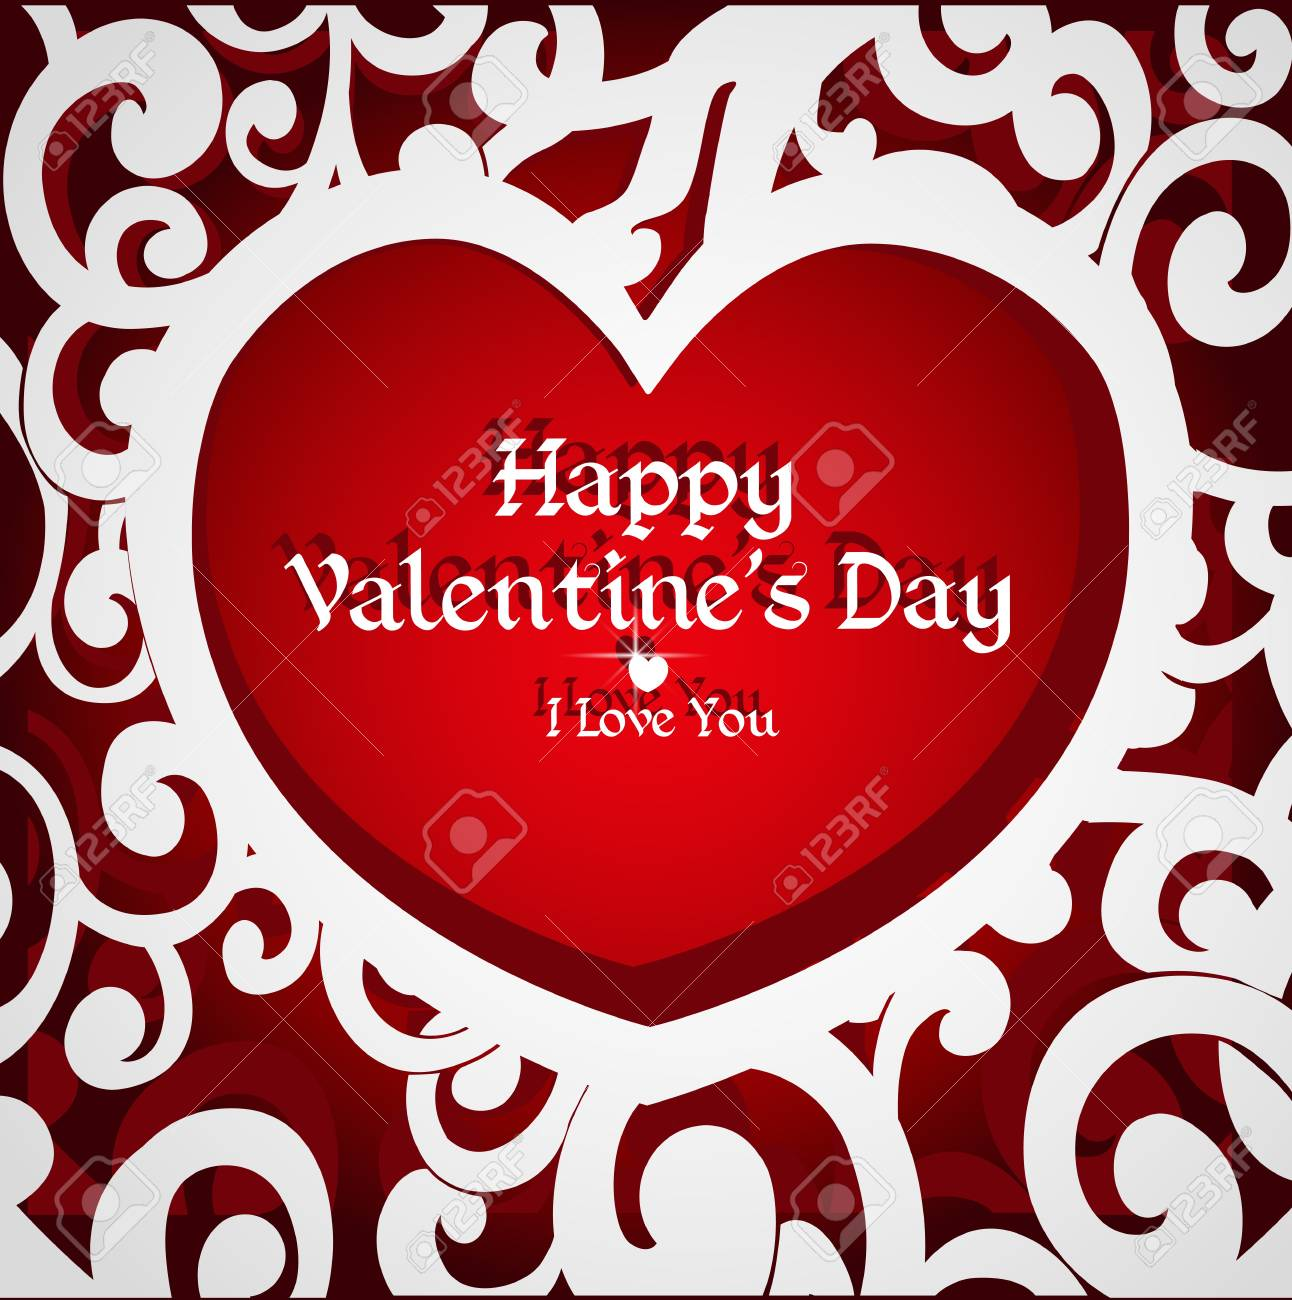 Delicate Openwork Appliques Valentine Card For Your Congratulations